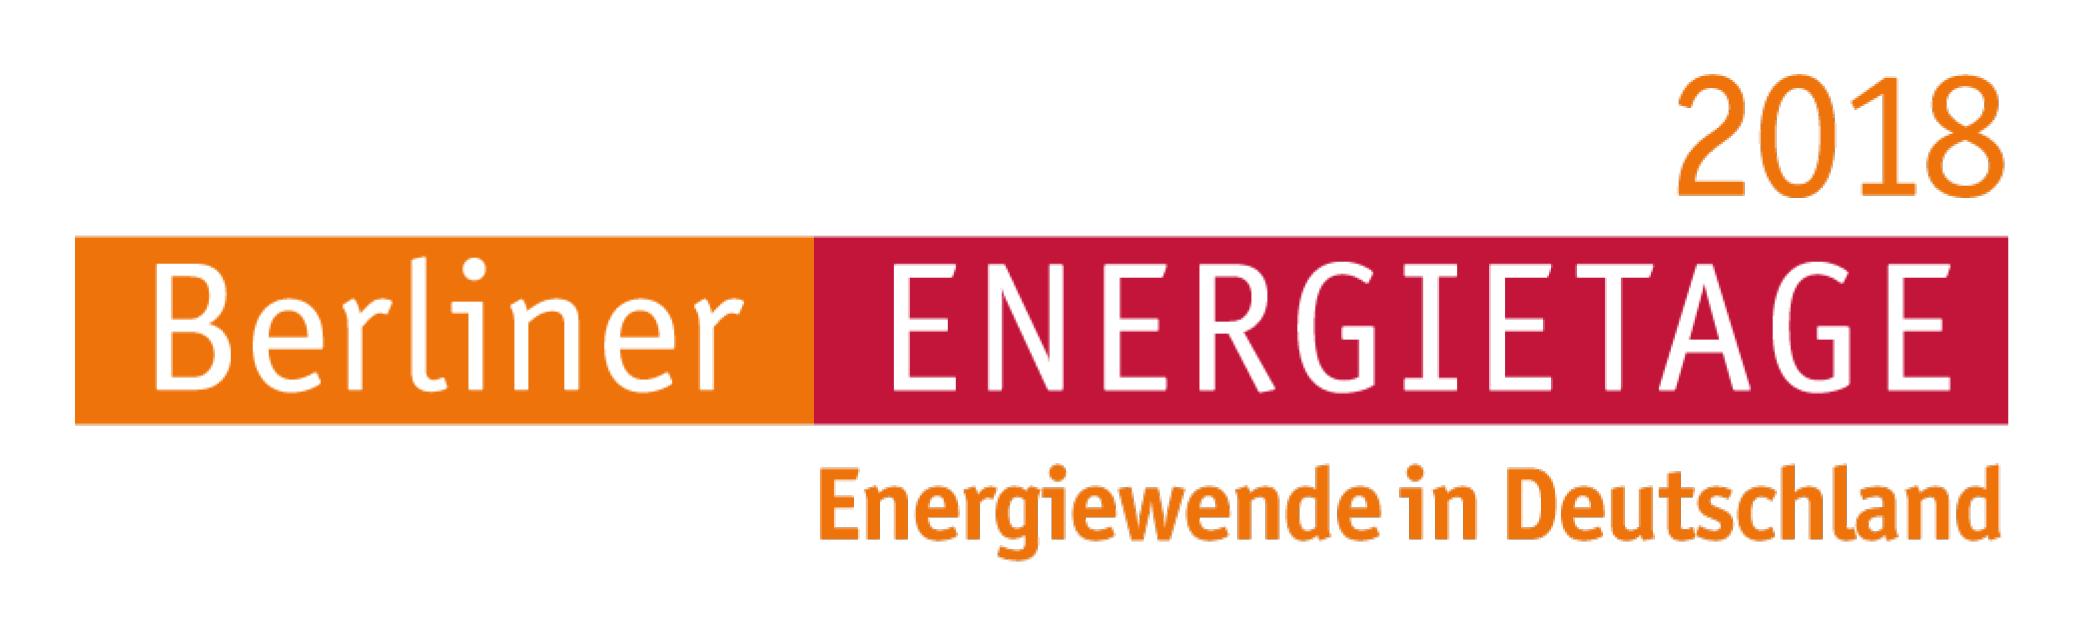 Logo Berliner Energietage 2018